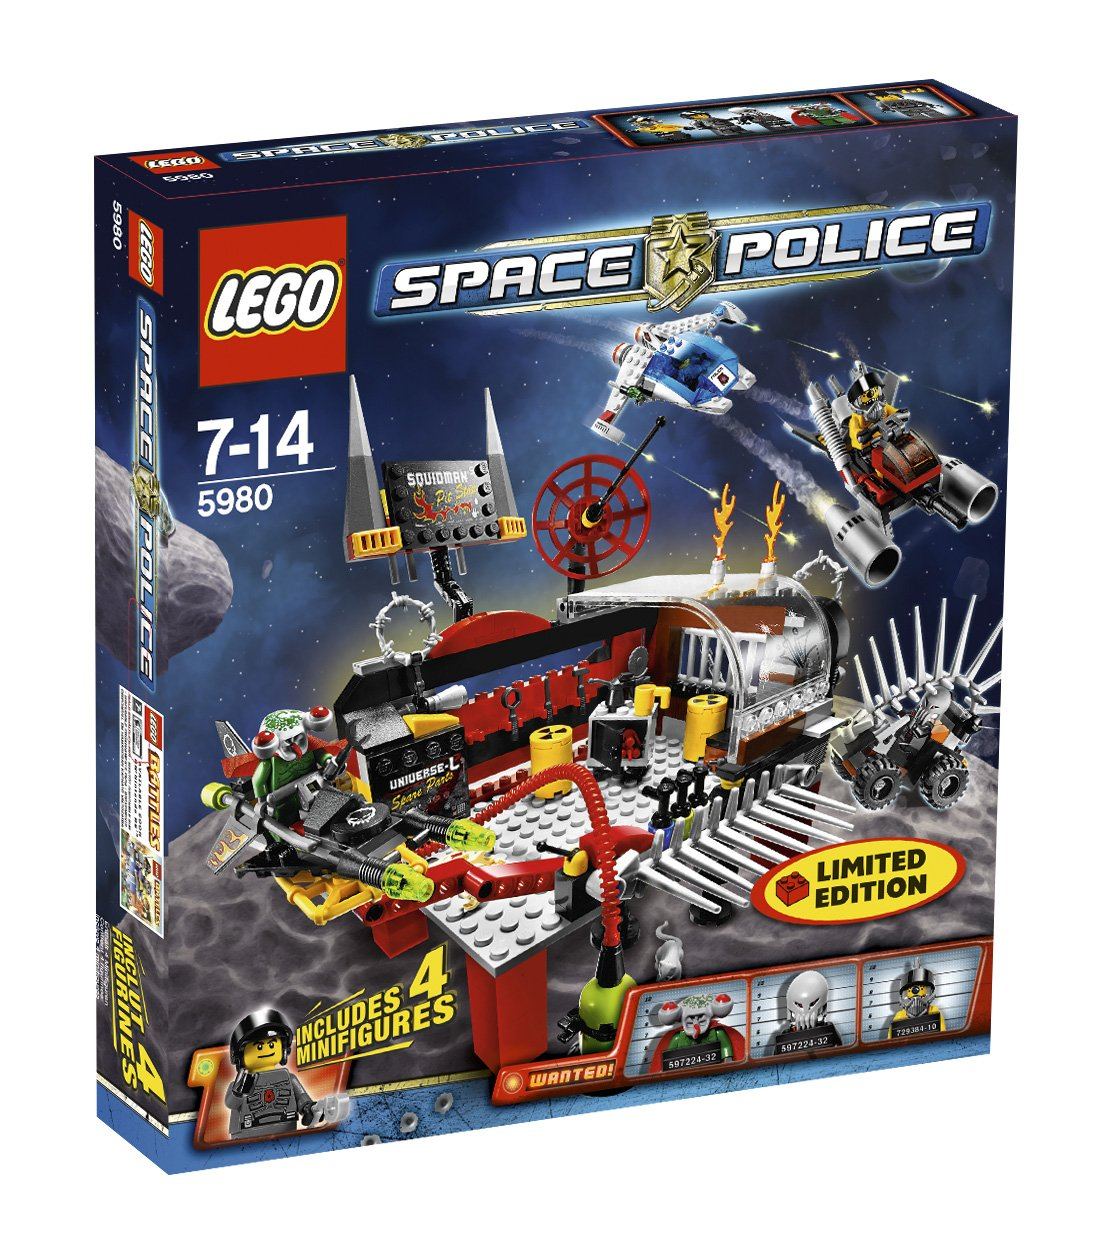 LEGO Space Police 5980 - Alien Werkstatt